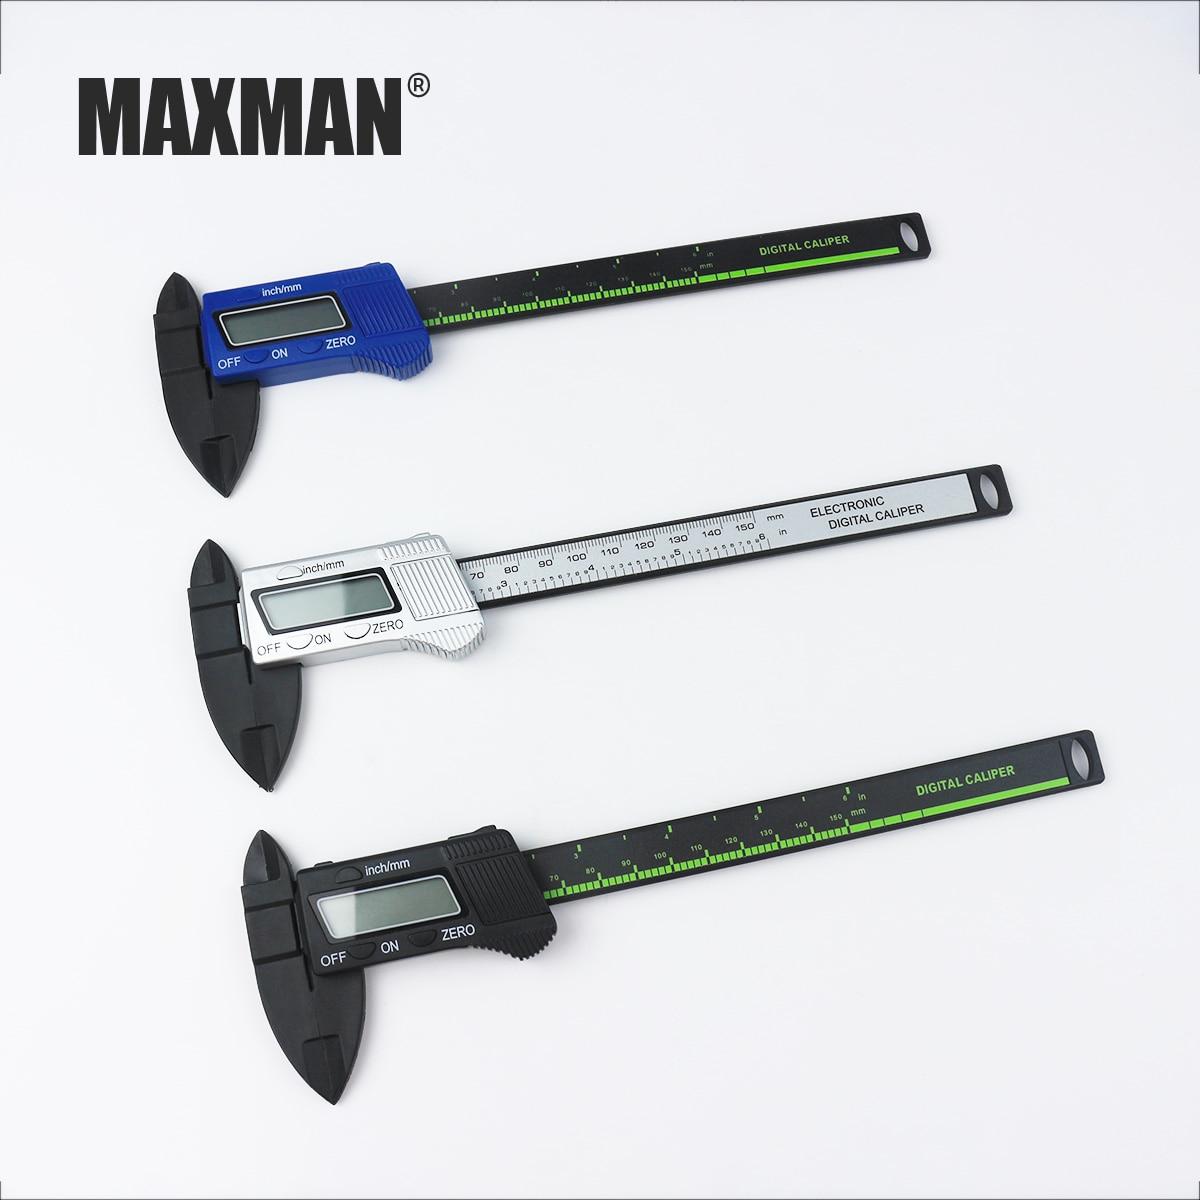 MAXMAN 0-150mm Measuring Tool Stainless Steel Caliper Digital Vernier Caliper Gauge Micrometer Measuring Instrument